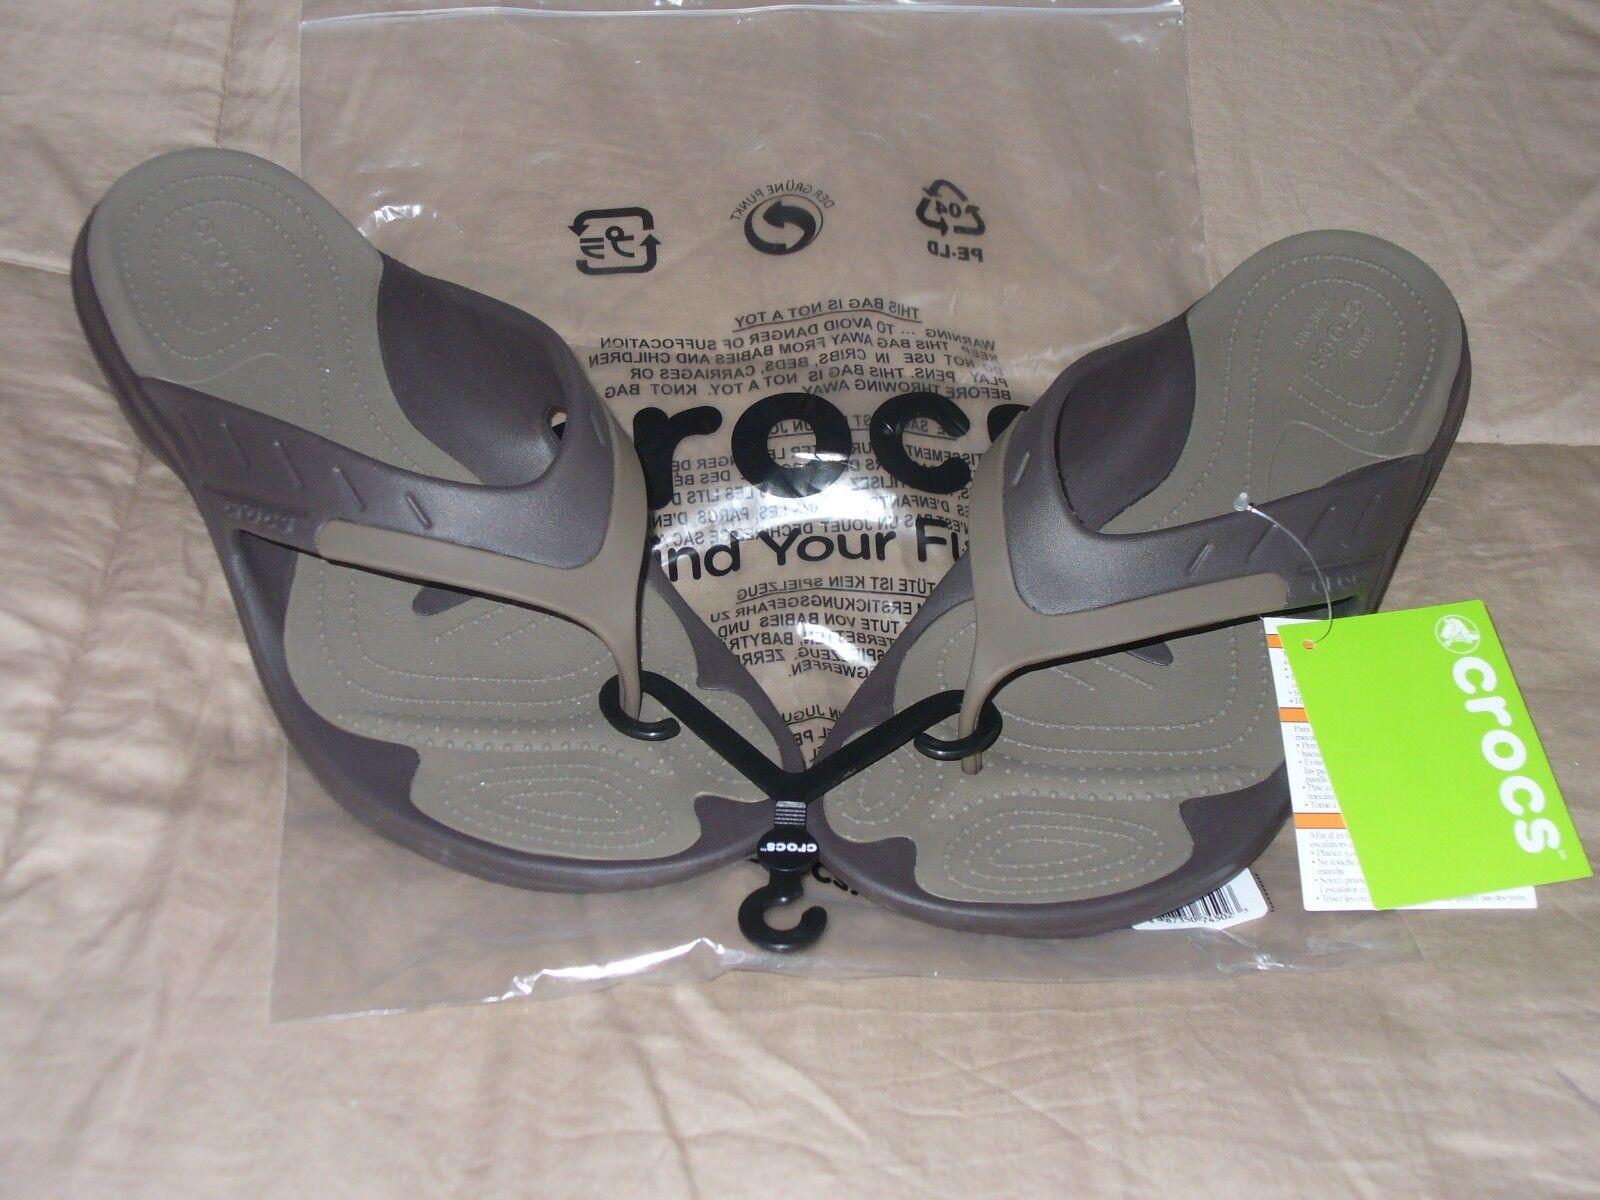 Crocs Modi Sport Flip Flop Sandal 202636-23B Espresso Walnut 100% Authentic 12.